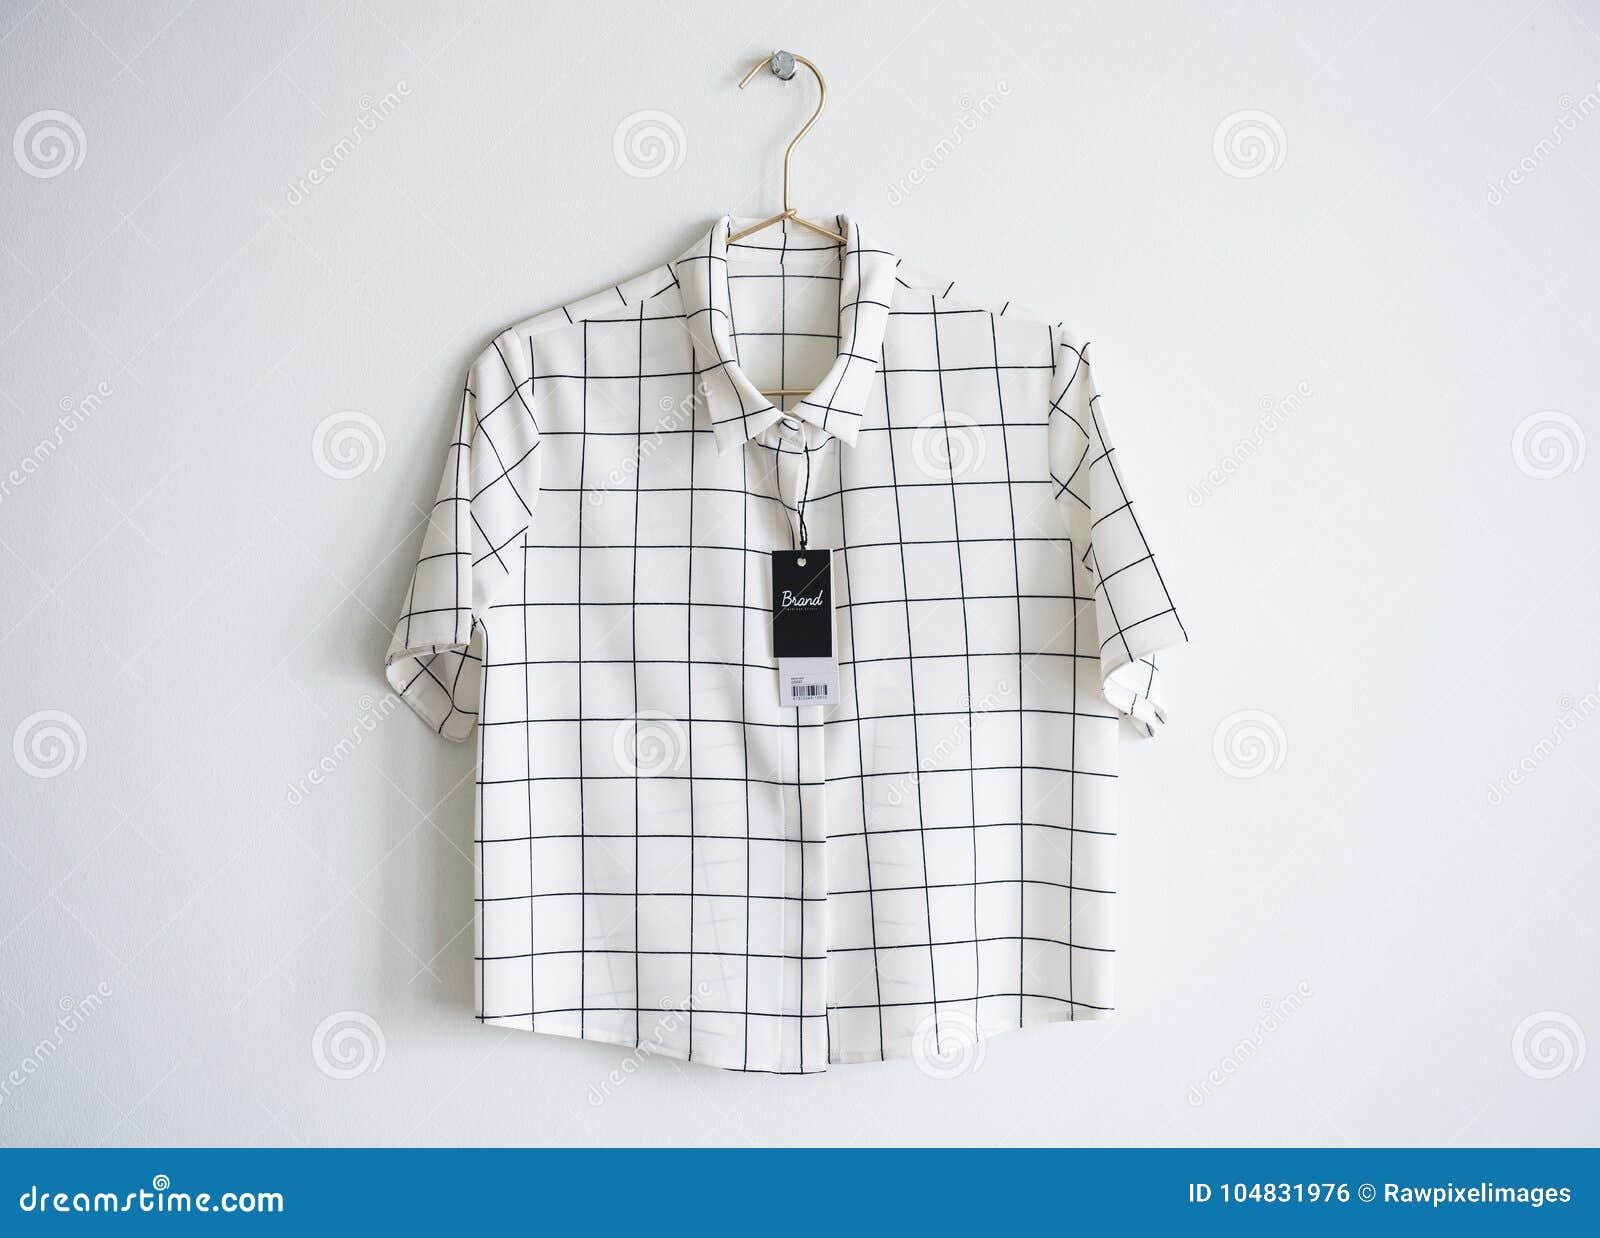 Minimal shirt design with price tag